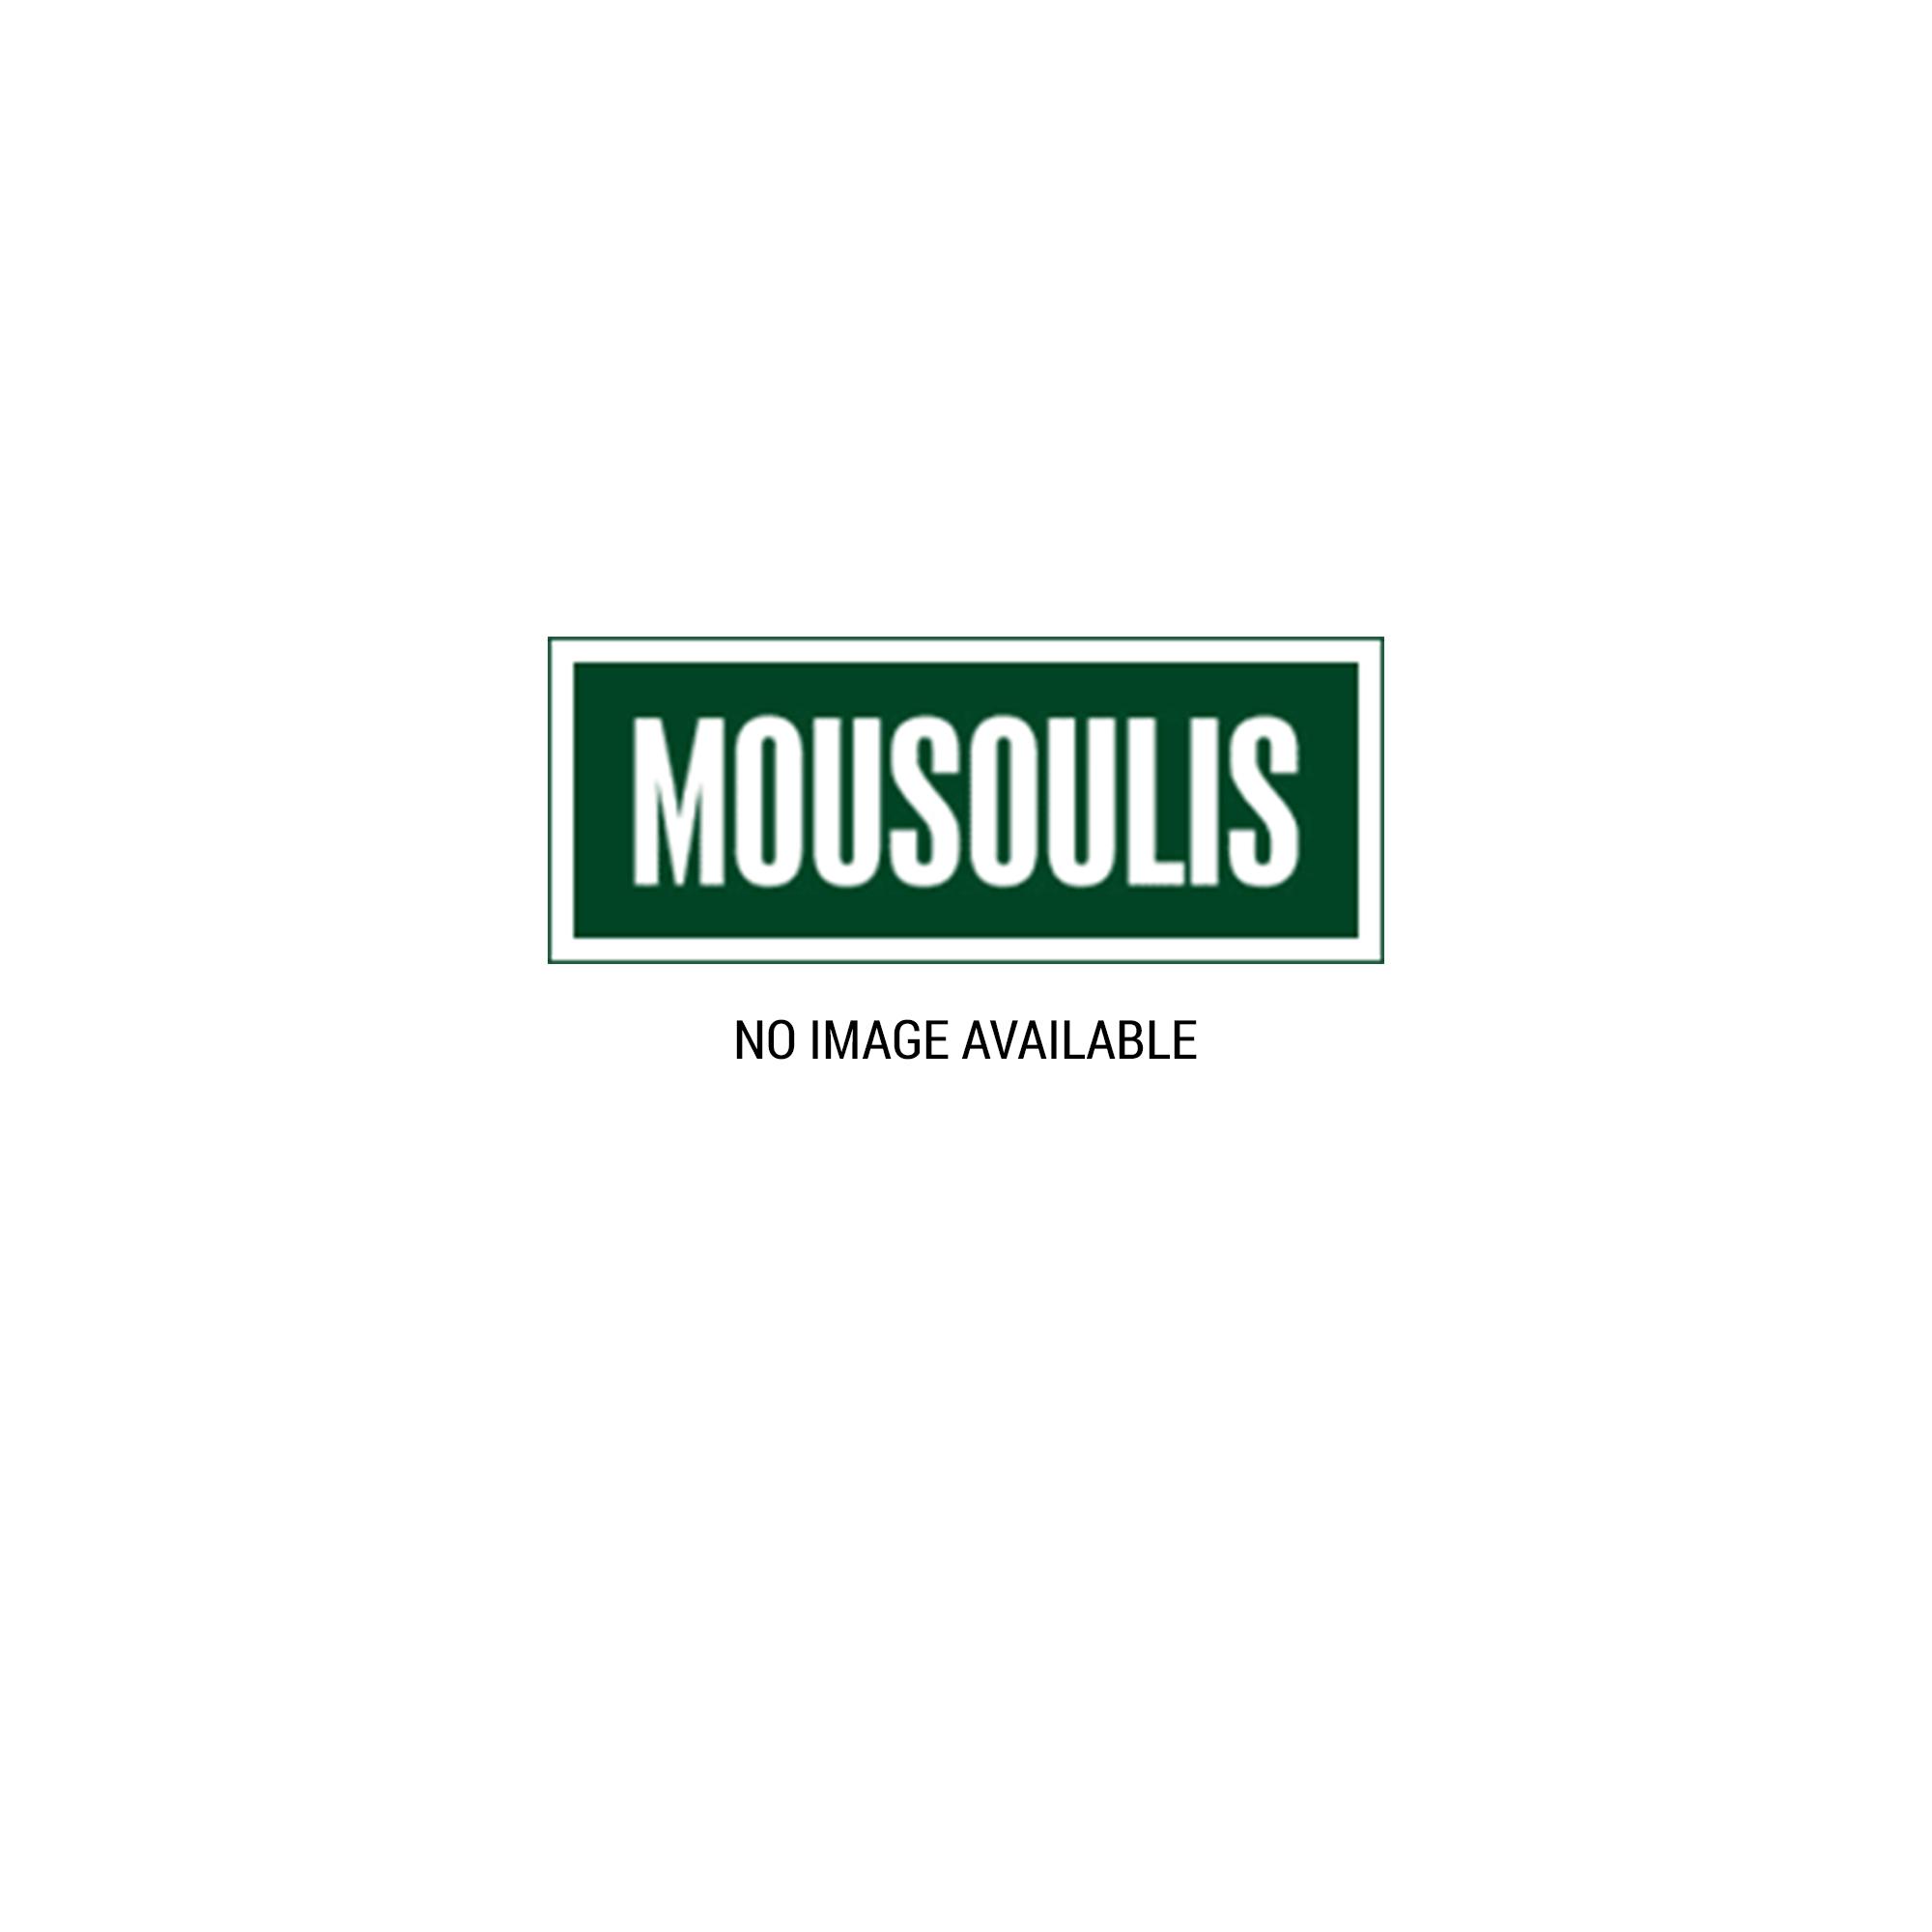 Barbour Lifestyle Κασκόλ Μάλλινο Μονόχρωμο με Κρόσια Plain Lambswool USC0008 Μπλε